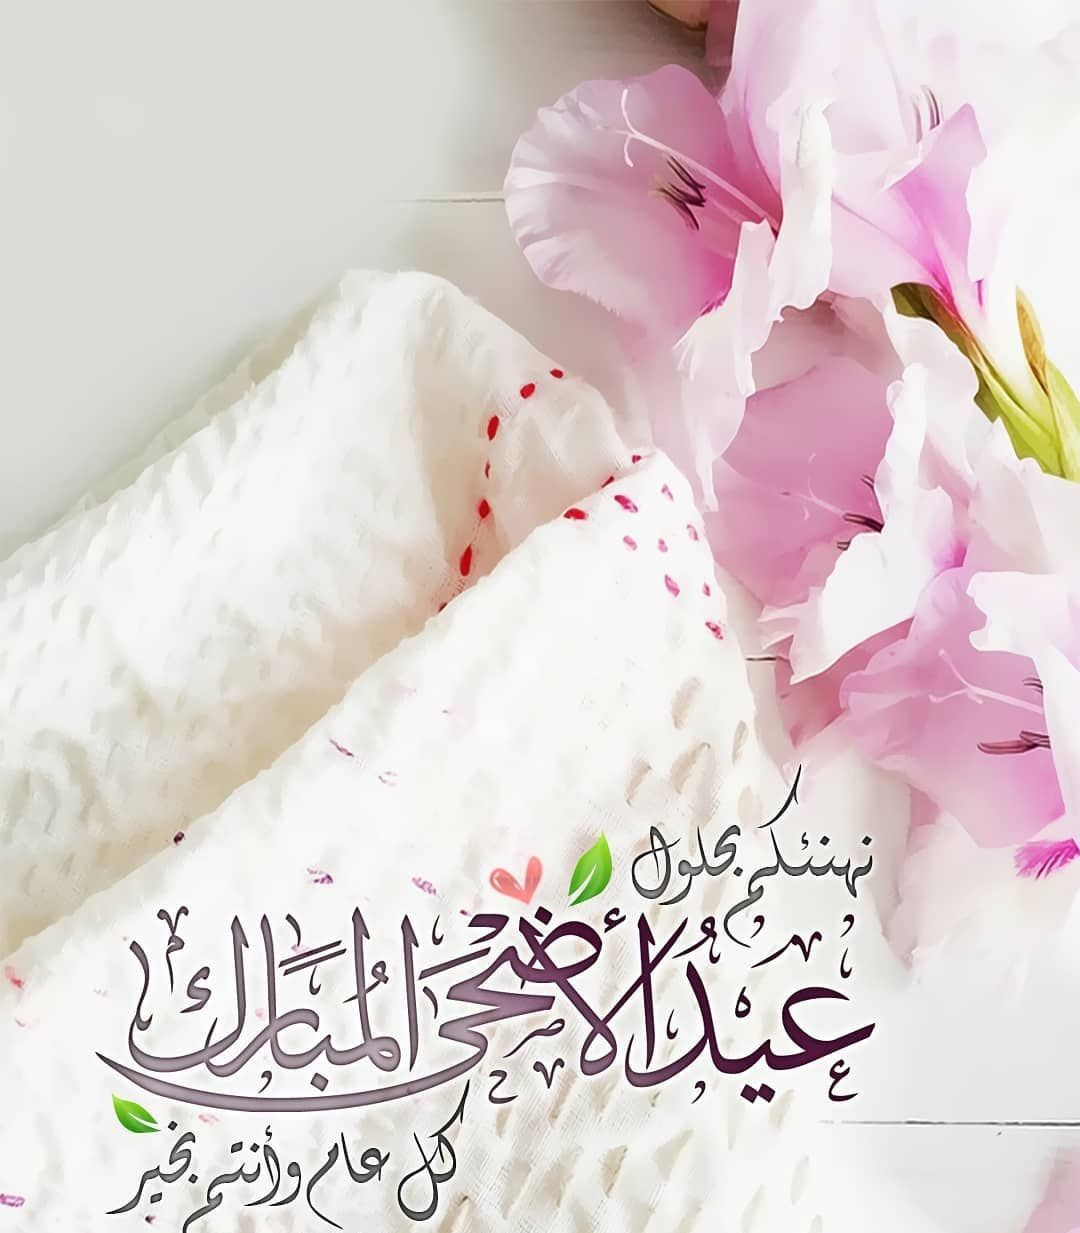 Pin By Rachida Rf On عـيـد سعـيــد Eid Mubarak Eid Mubarak Images Eid Mubarak Wishes